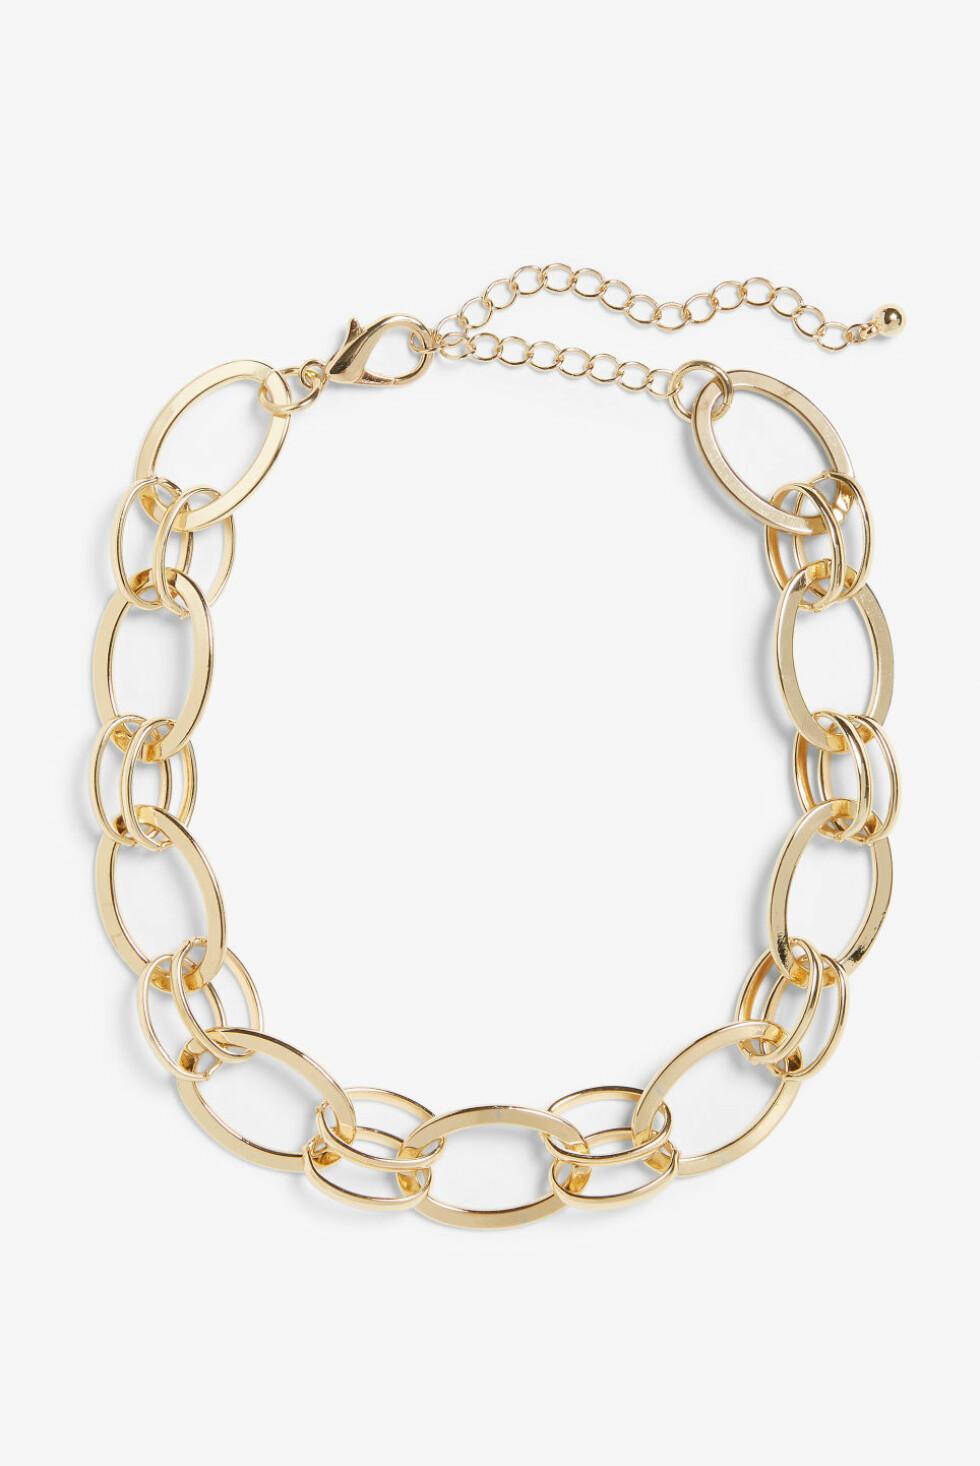 Kjede fra Monki  100,-  https://www.monki.com/en_sek/accessories/view-all-accessories/product.bold-statement-necklace-golden-metallic.0705336001.html